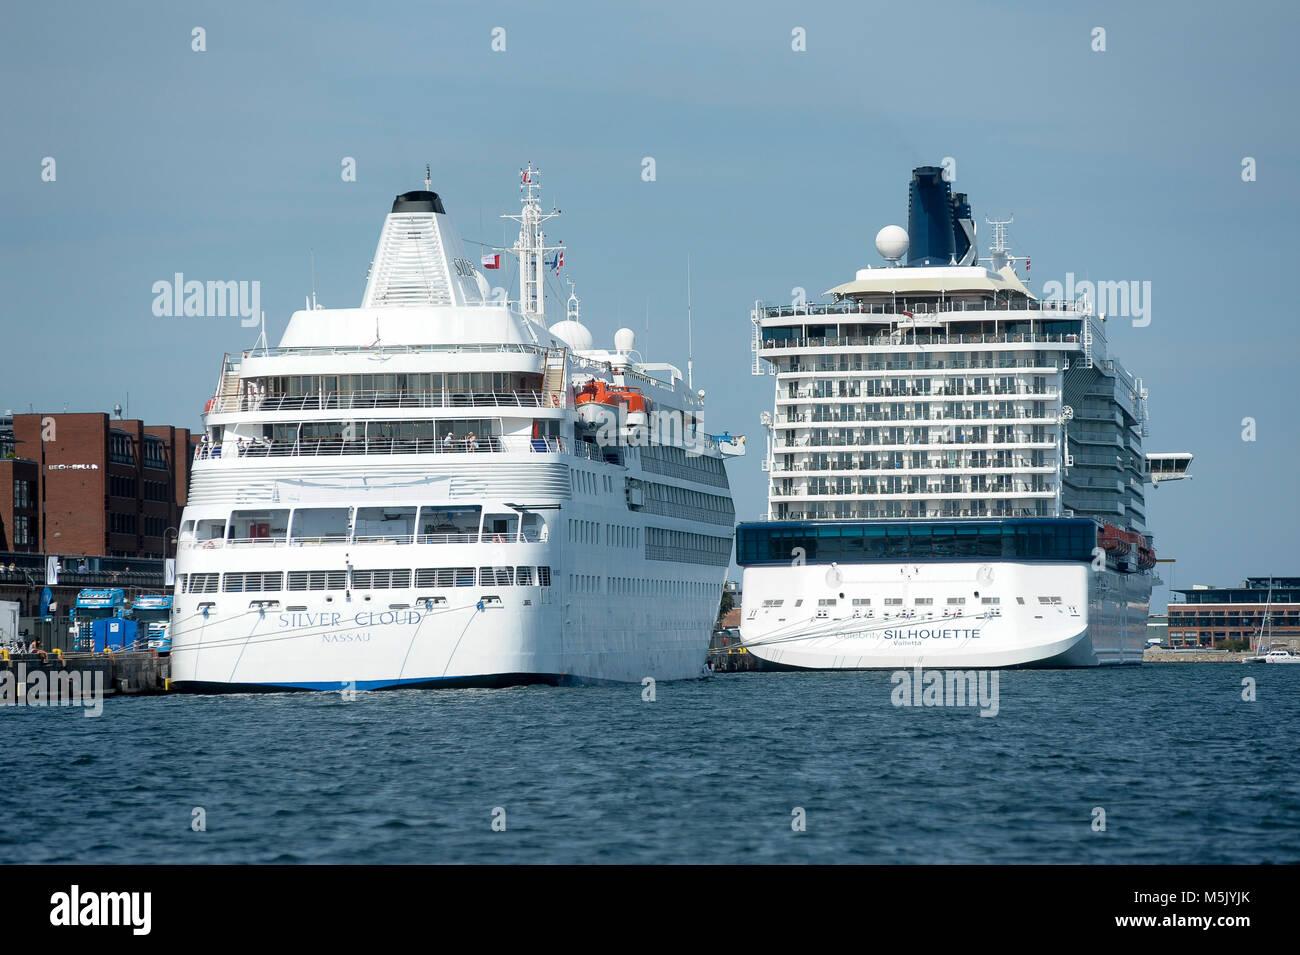 Sea Cloud Cruises Stock Photos Amp Sea Cloud Cruises Stock Images Alamy